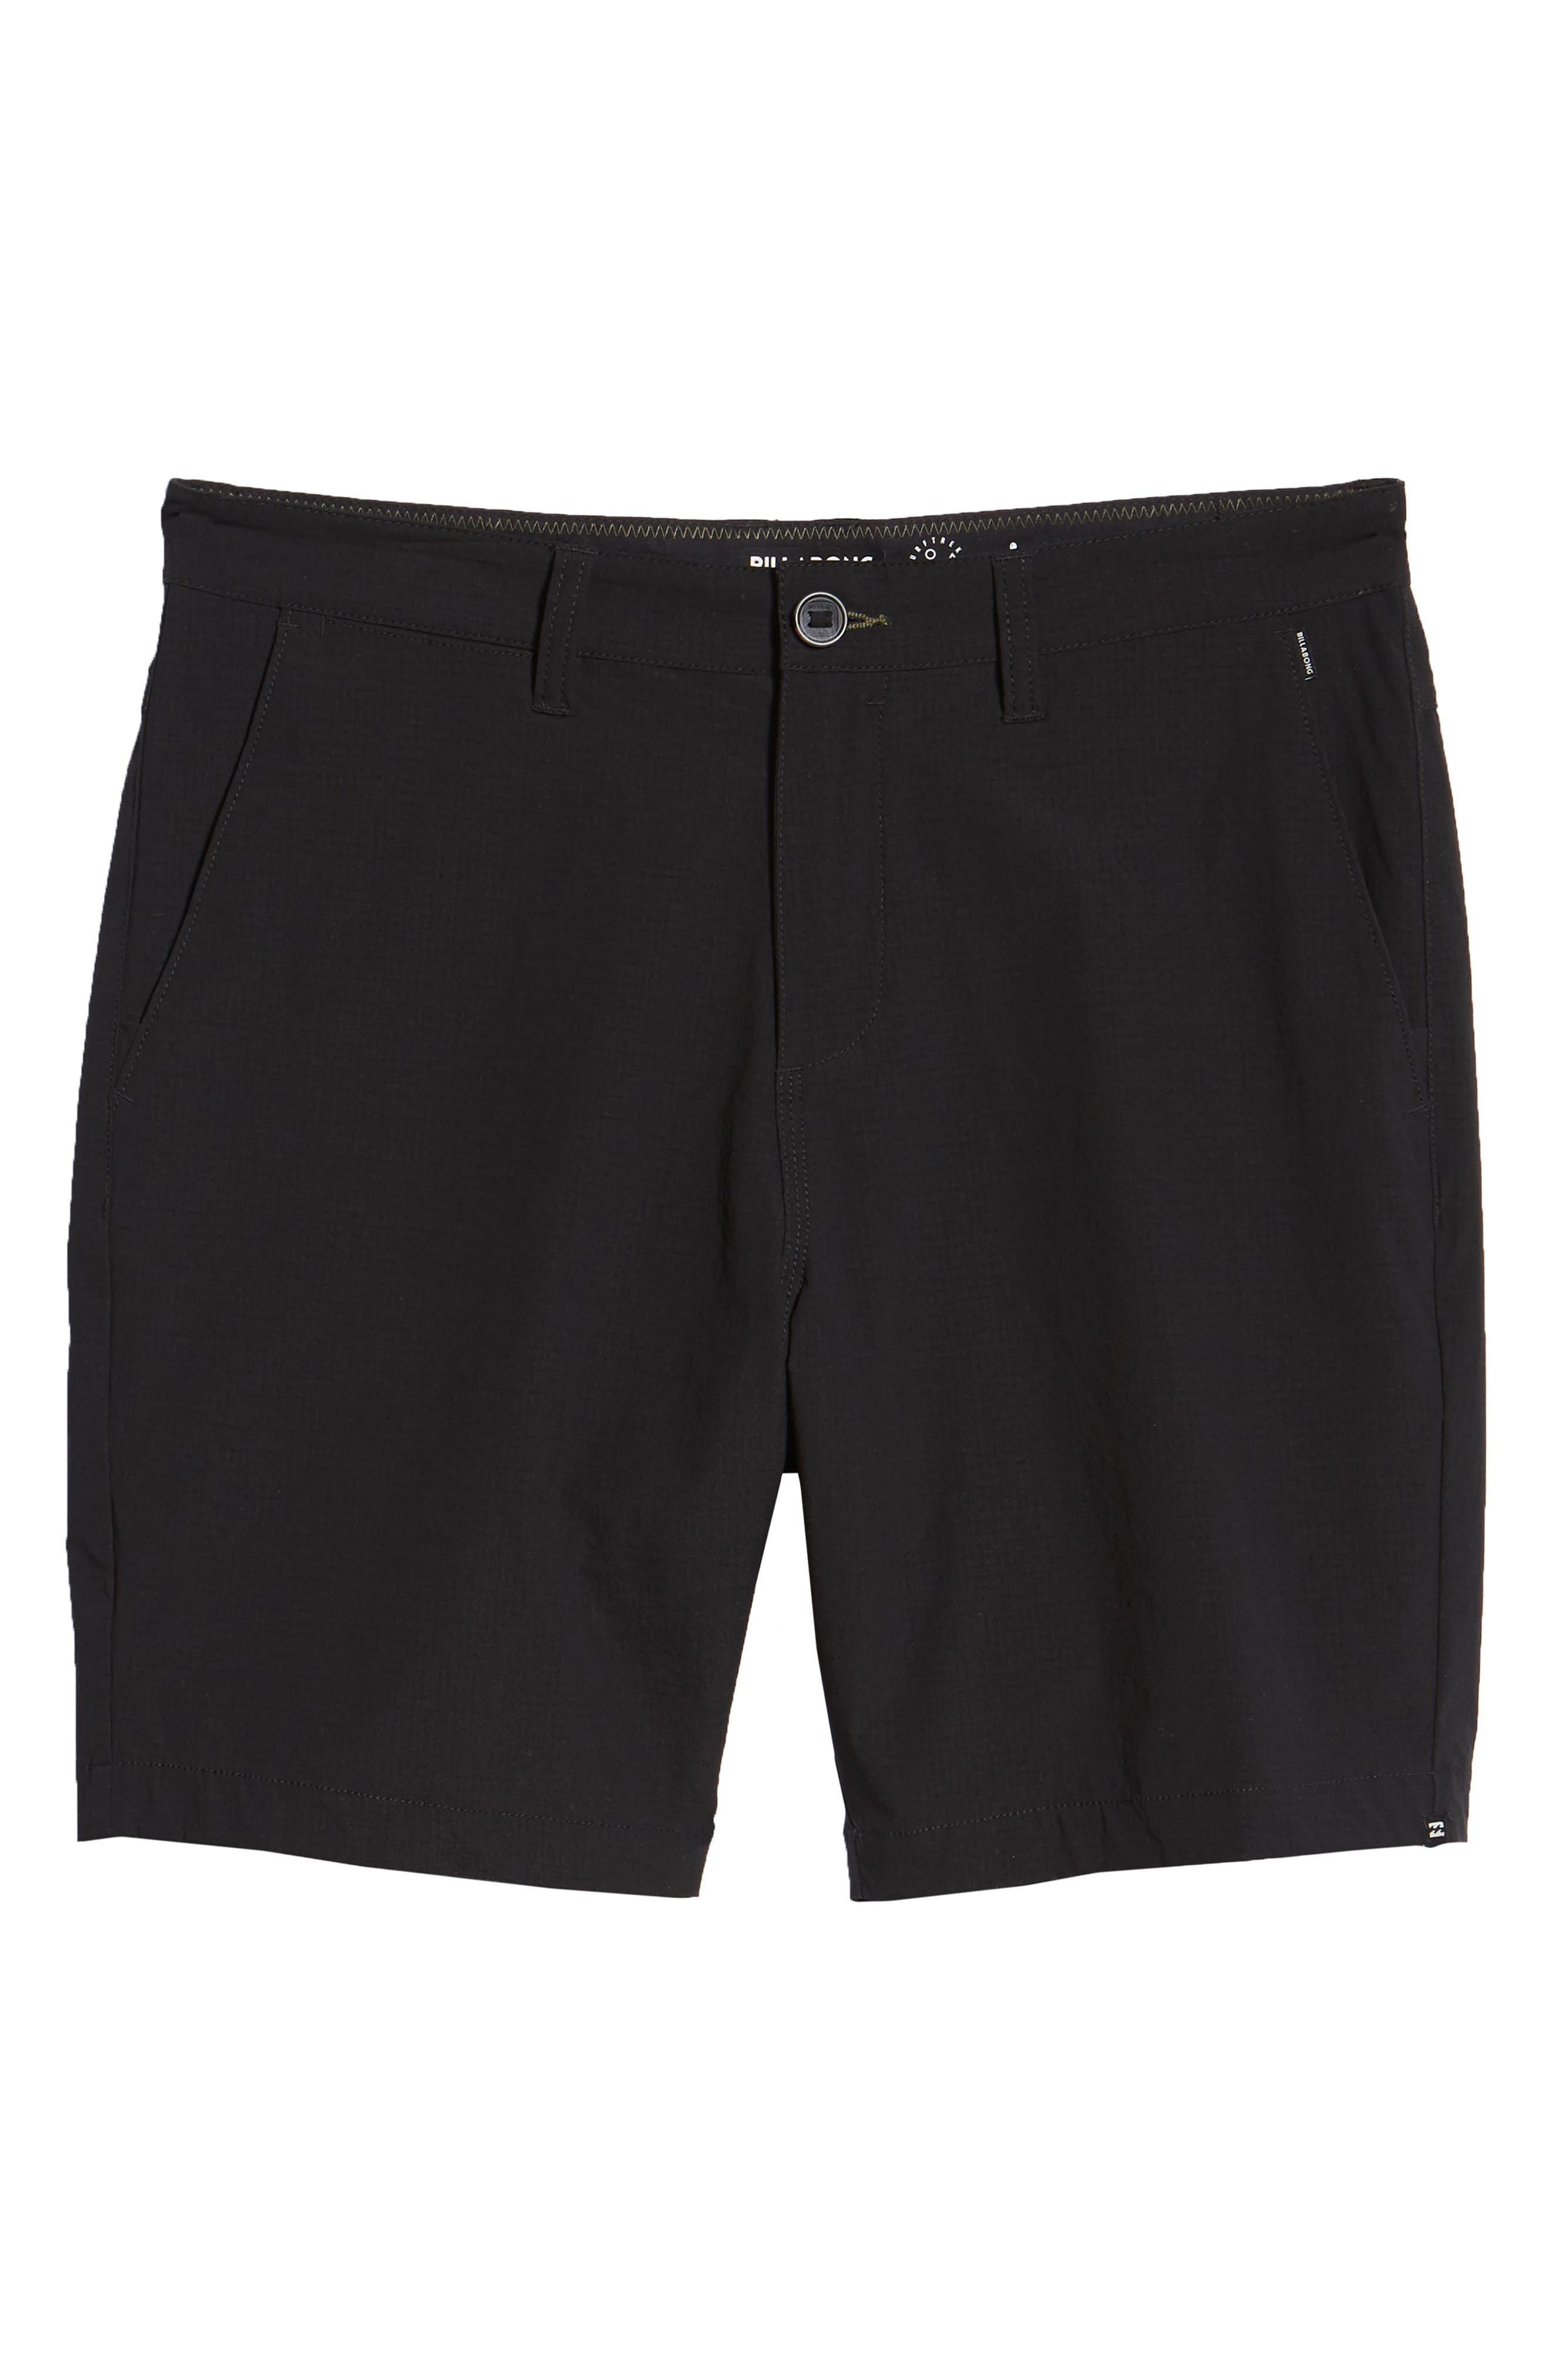 Surfreak Hybrid Shorts,                             Alternate thumbnail 6, color,                             BLACK